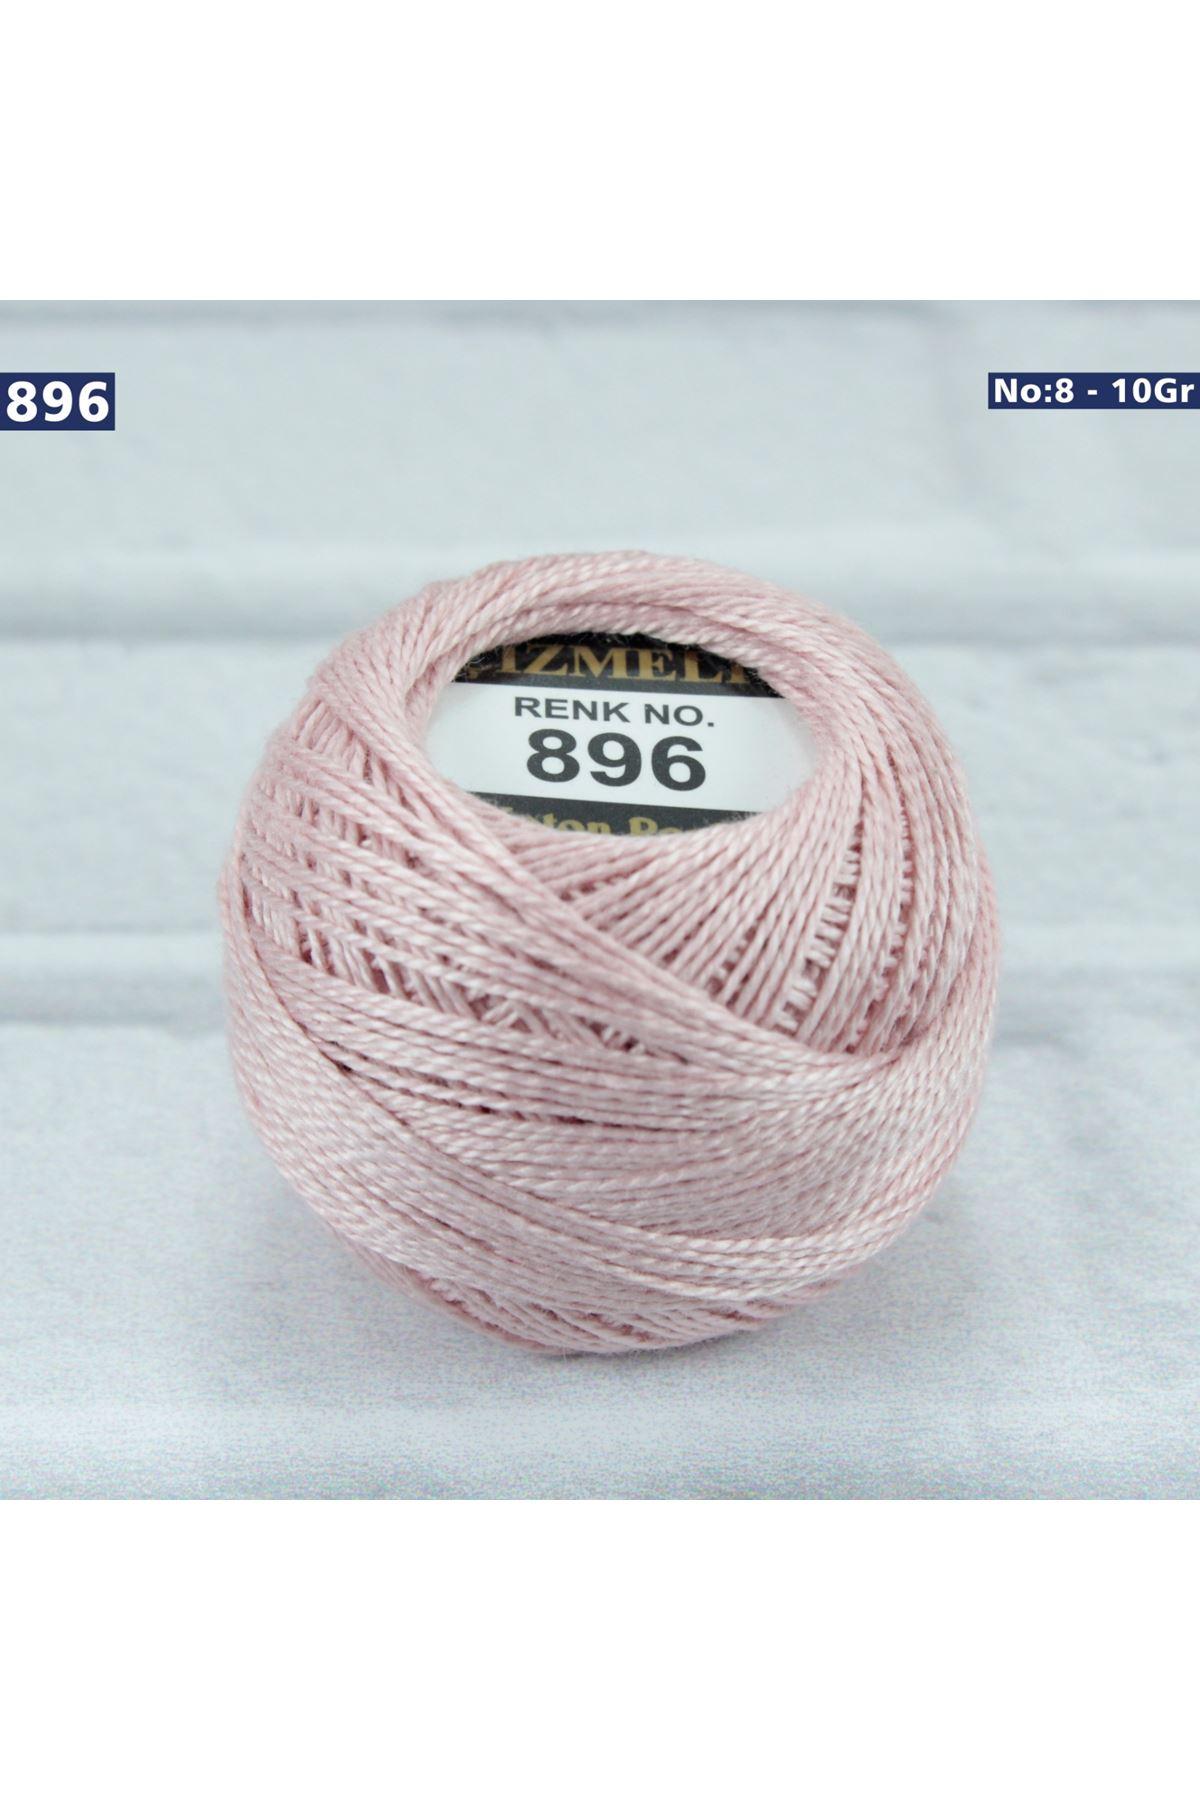 Çizmeli Cotton Perle Nakış İpliği No: 896